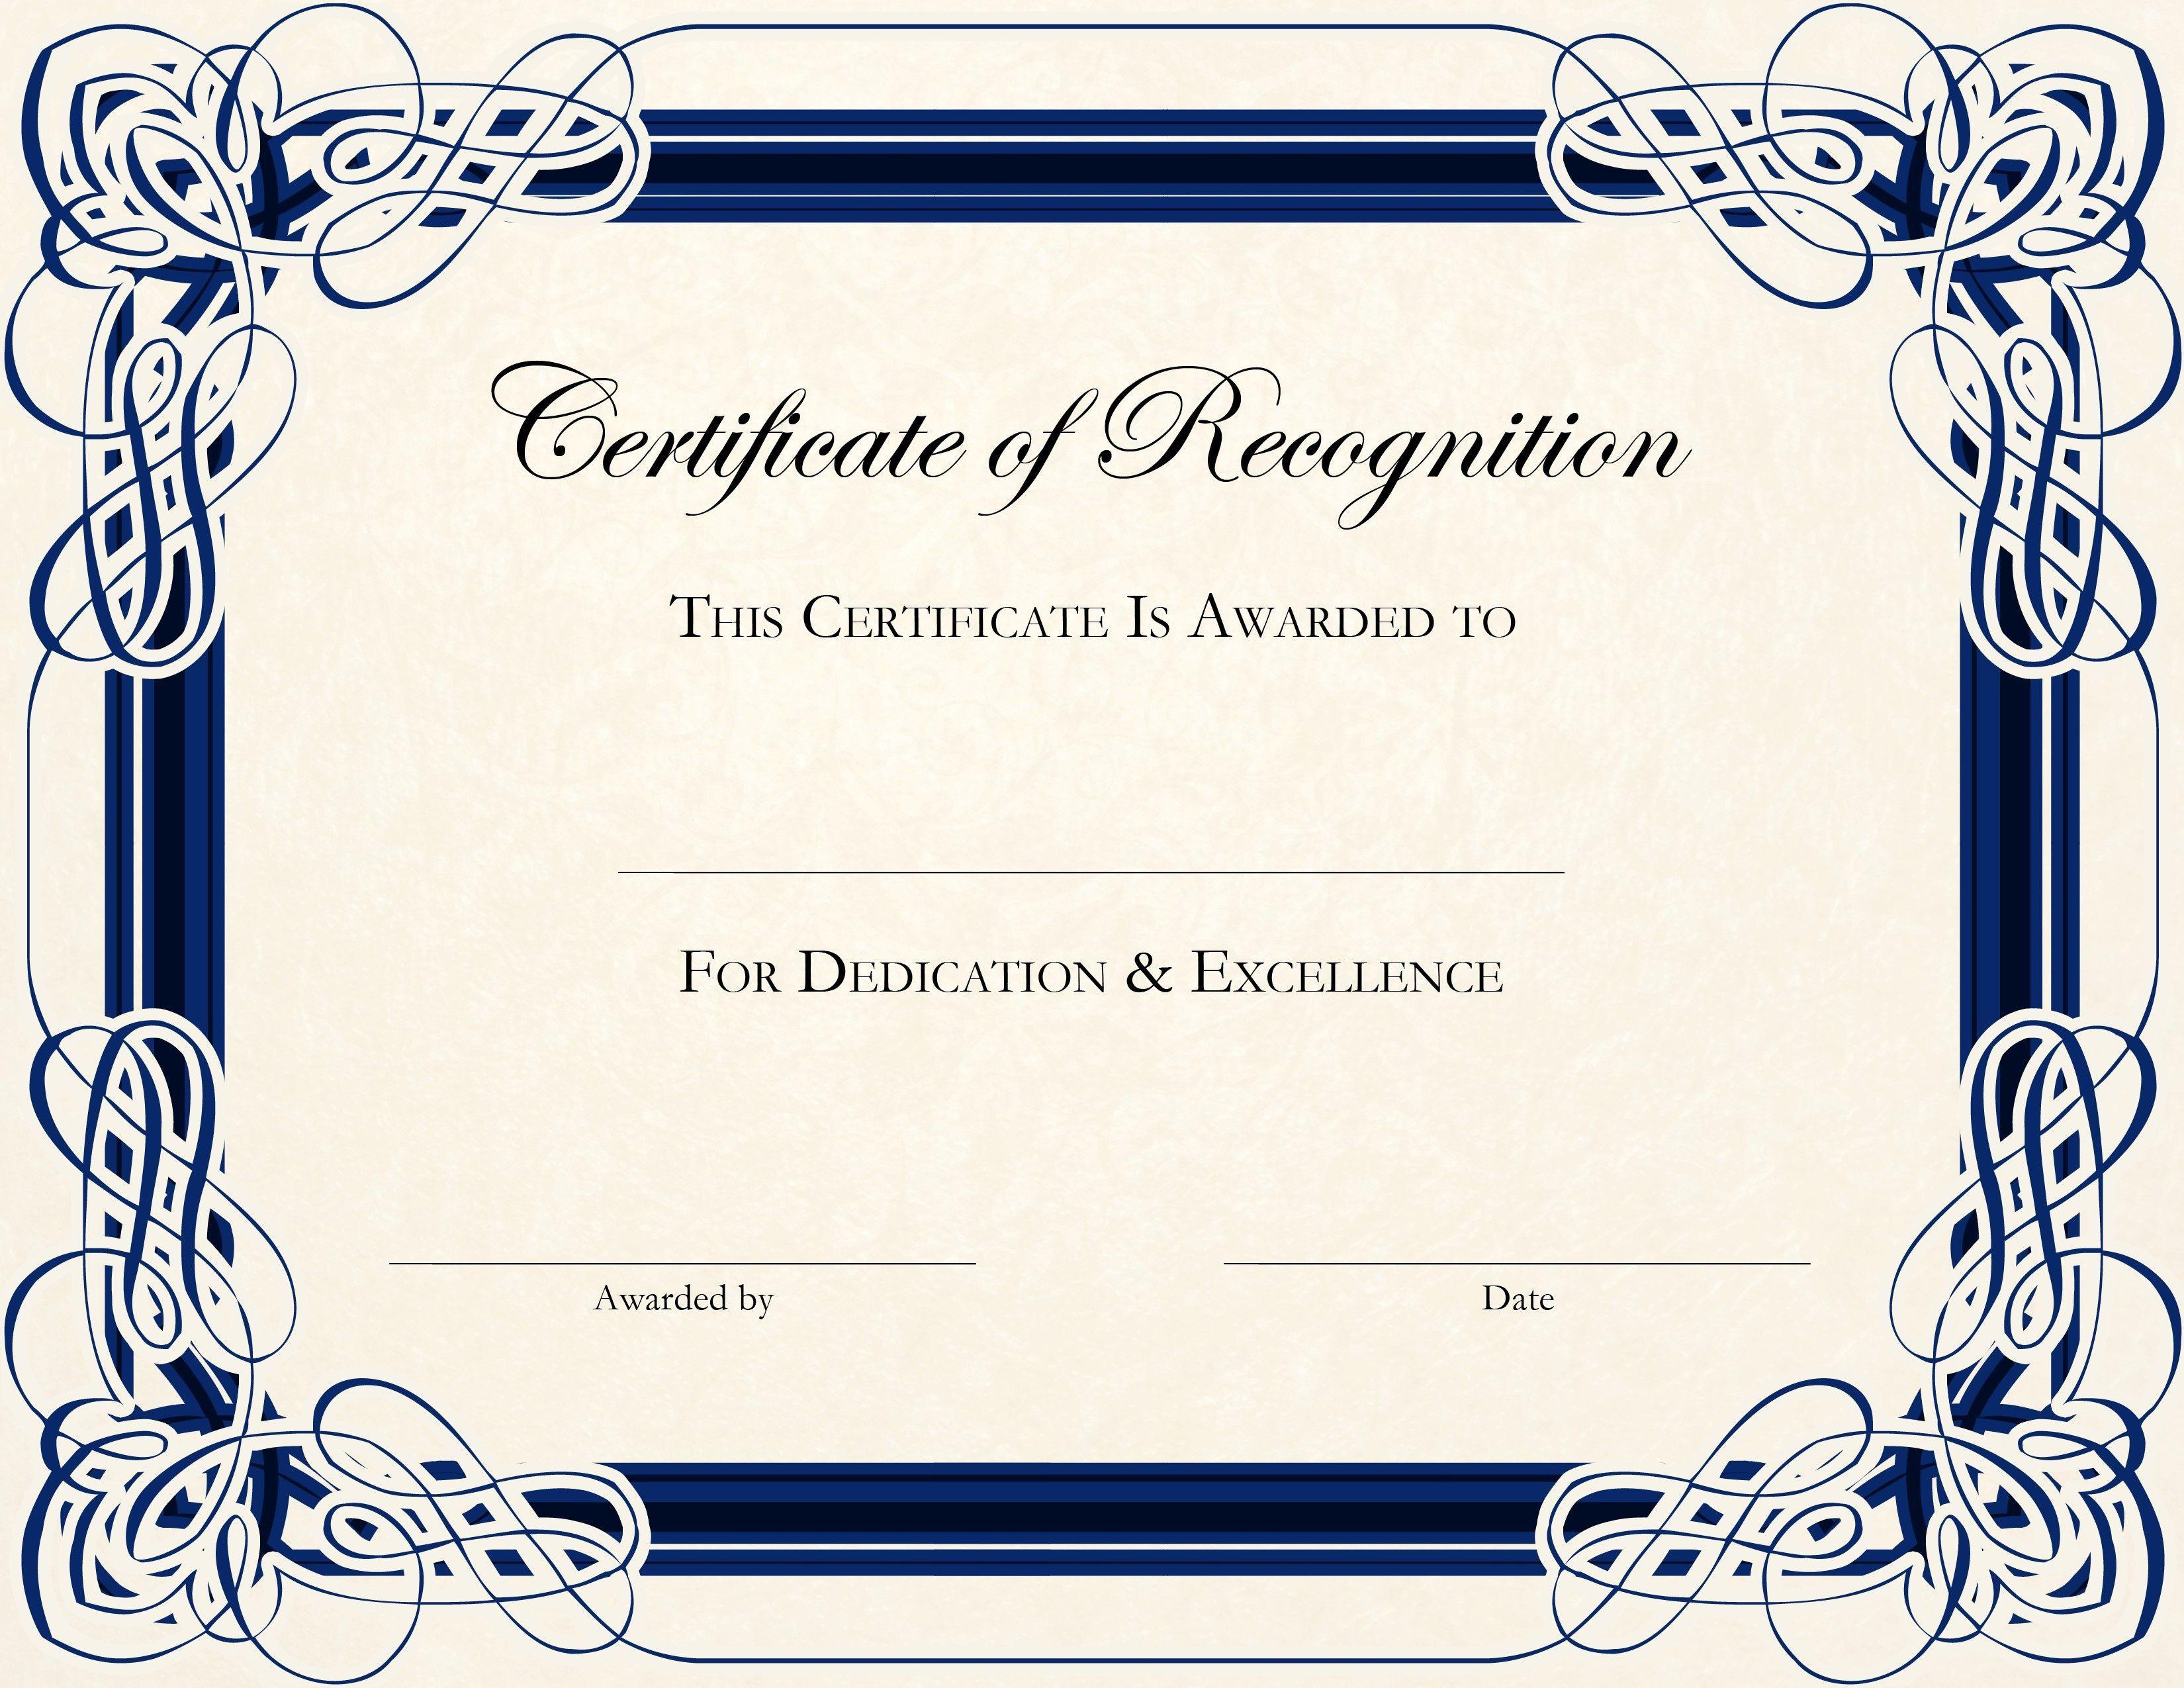 002 Sensational Free Certificate Template Microsoft Word Design  Of Authenticity Art Puppy Birth MarriageFull